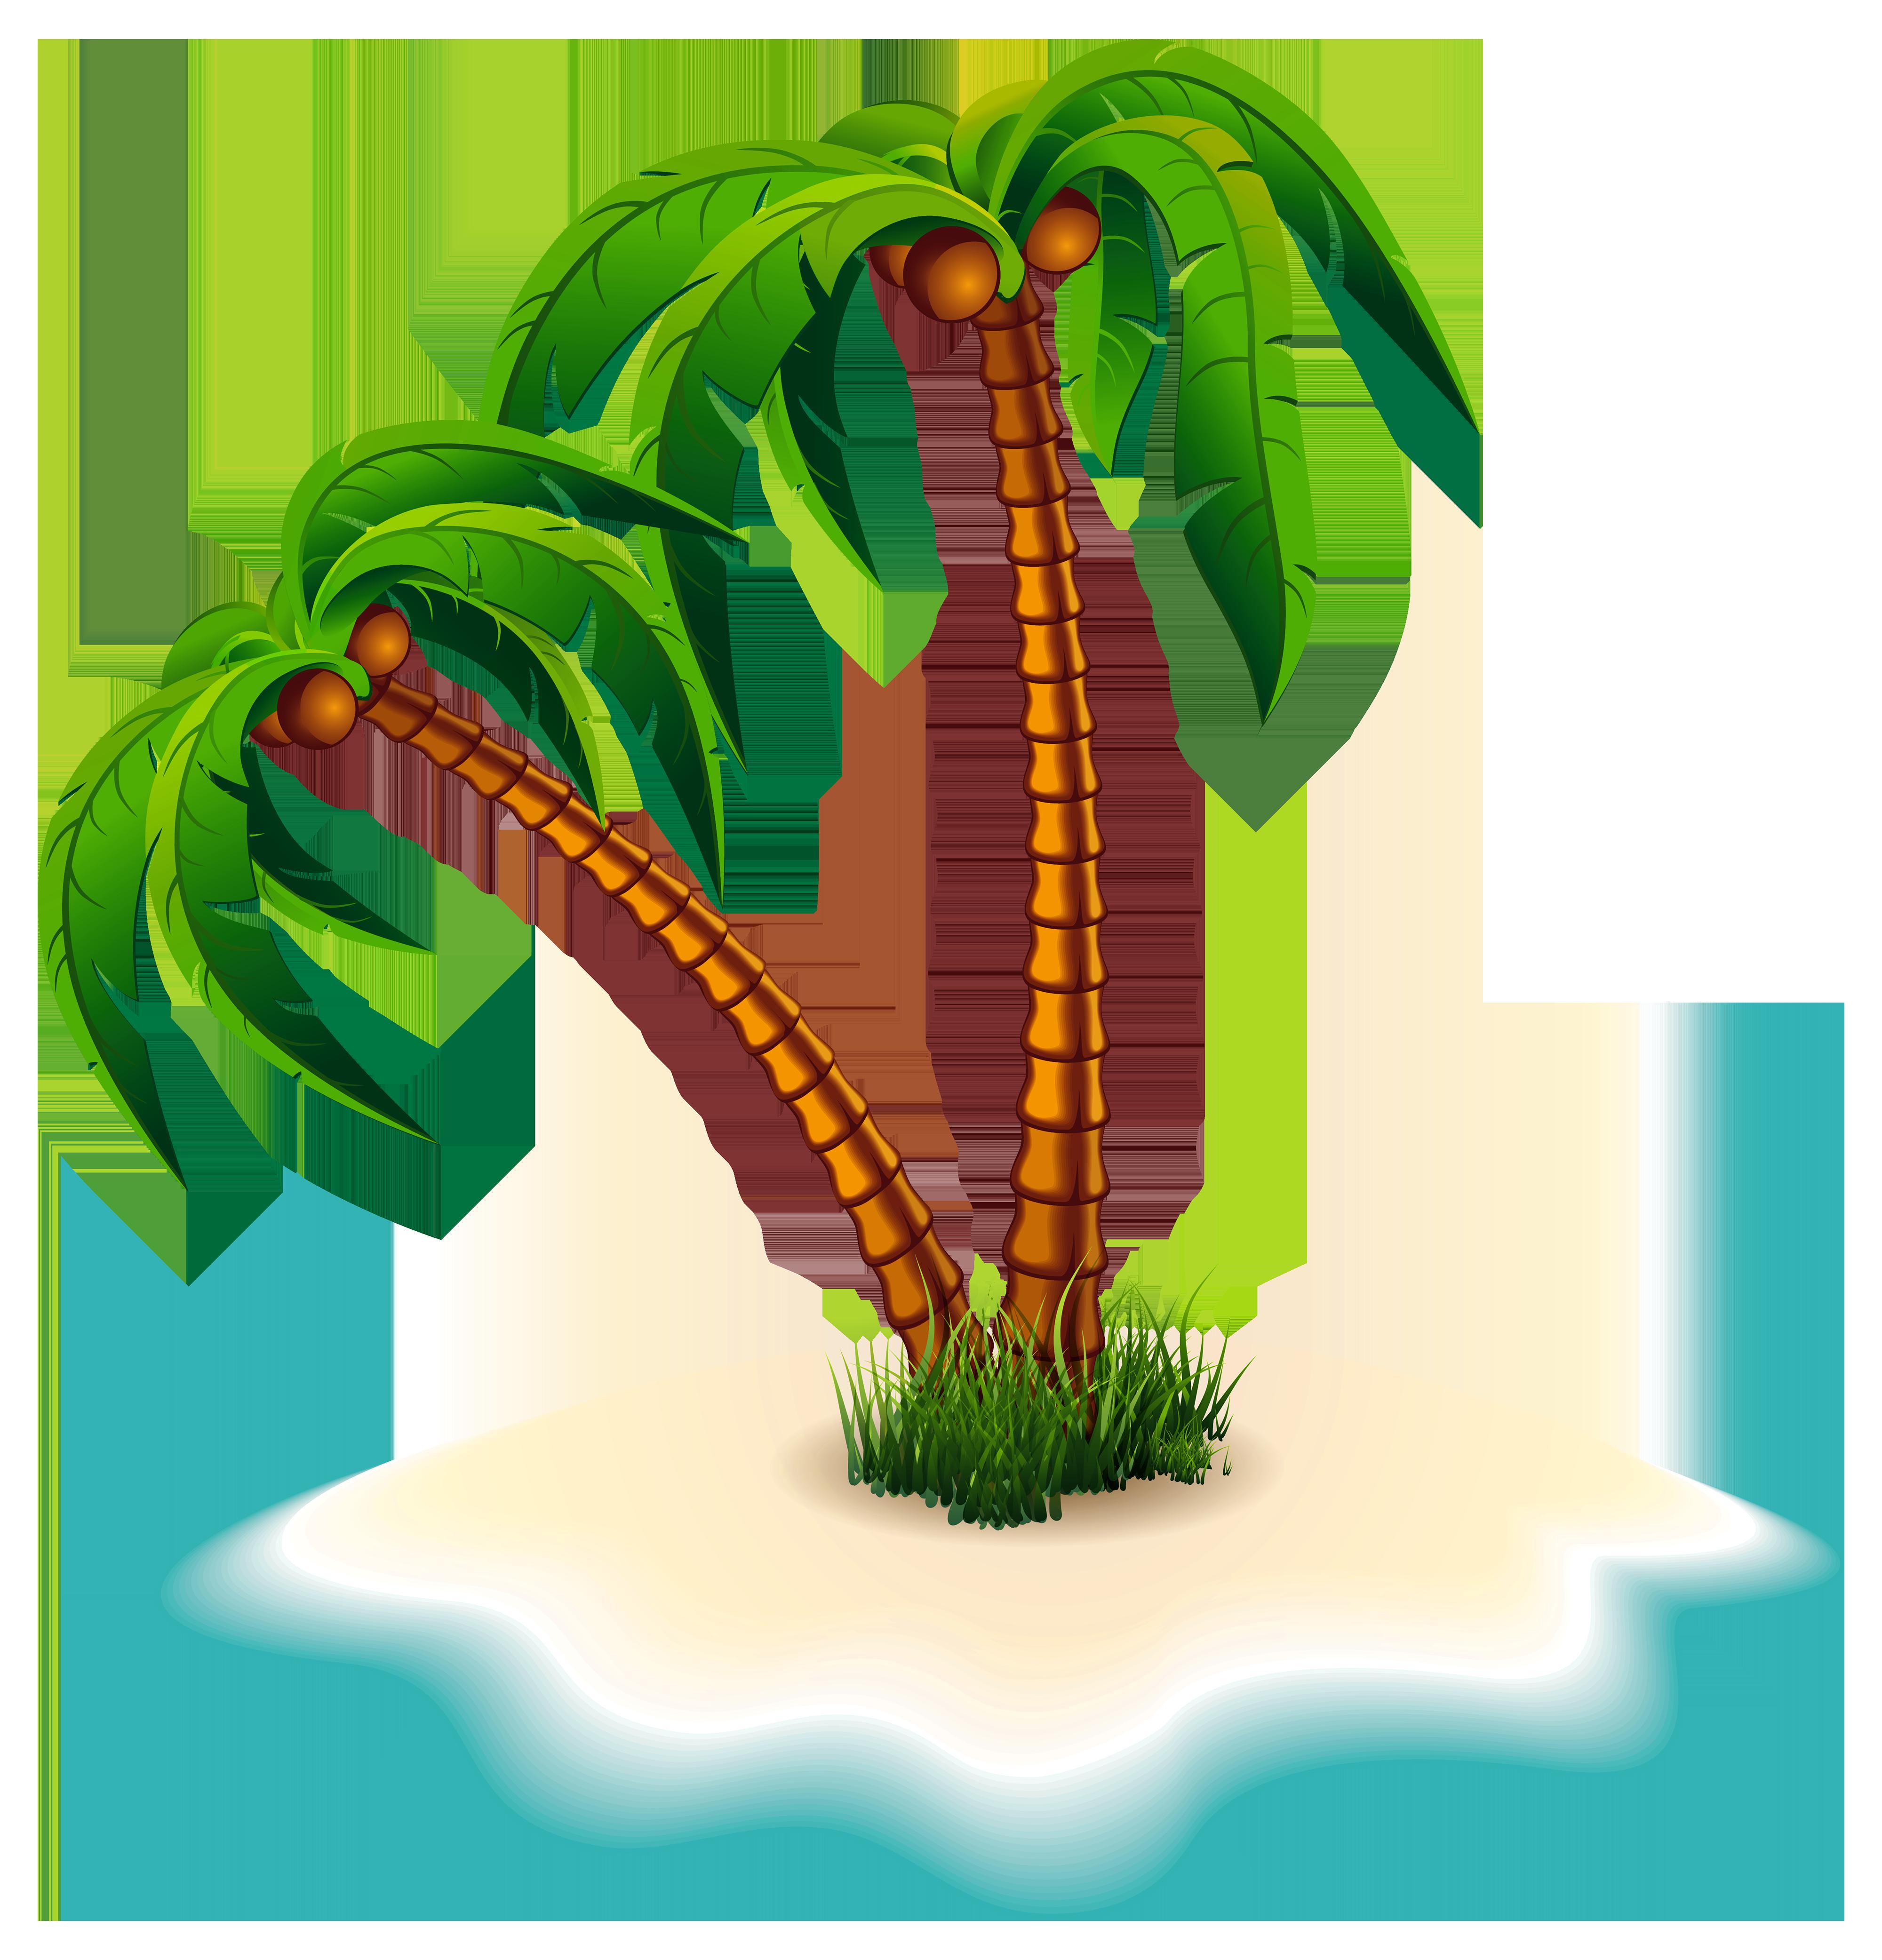 4000x4166 Palms Island Clipart, Explore Pictures